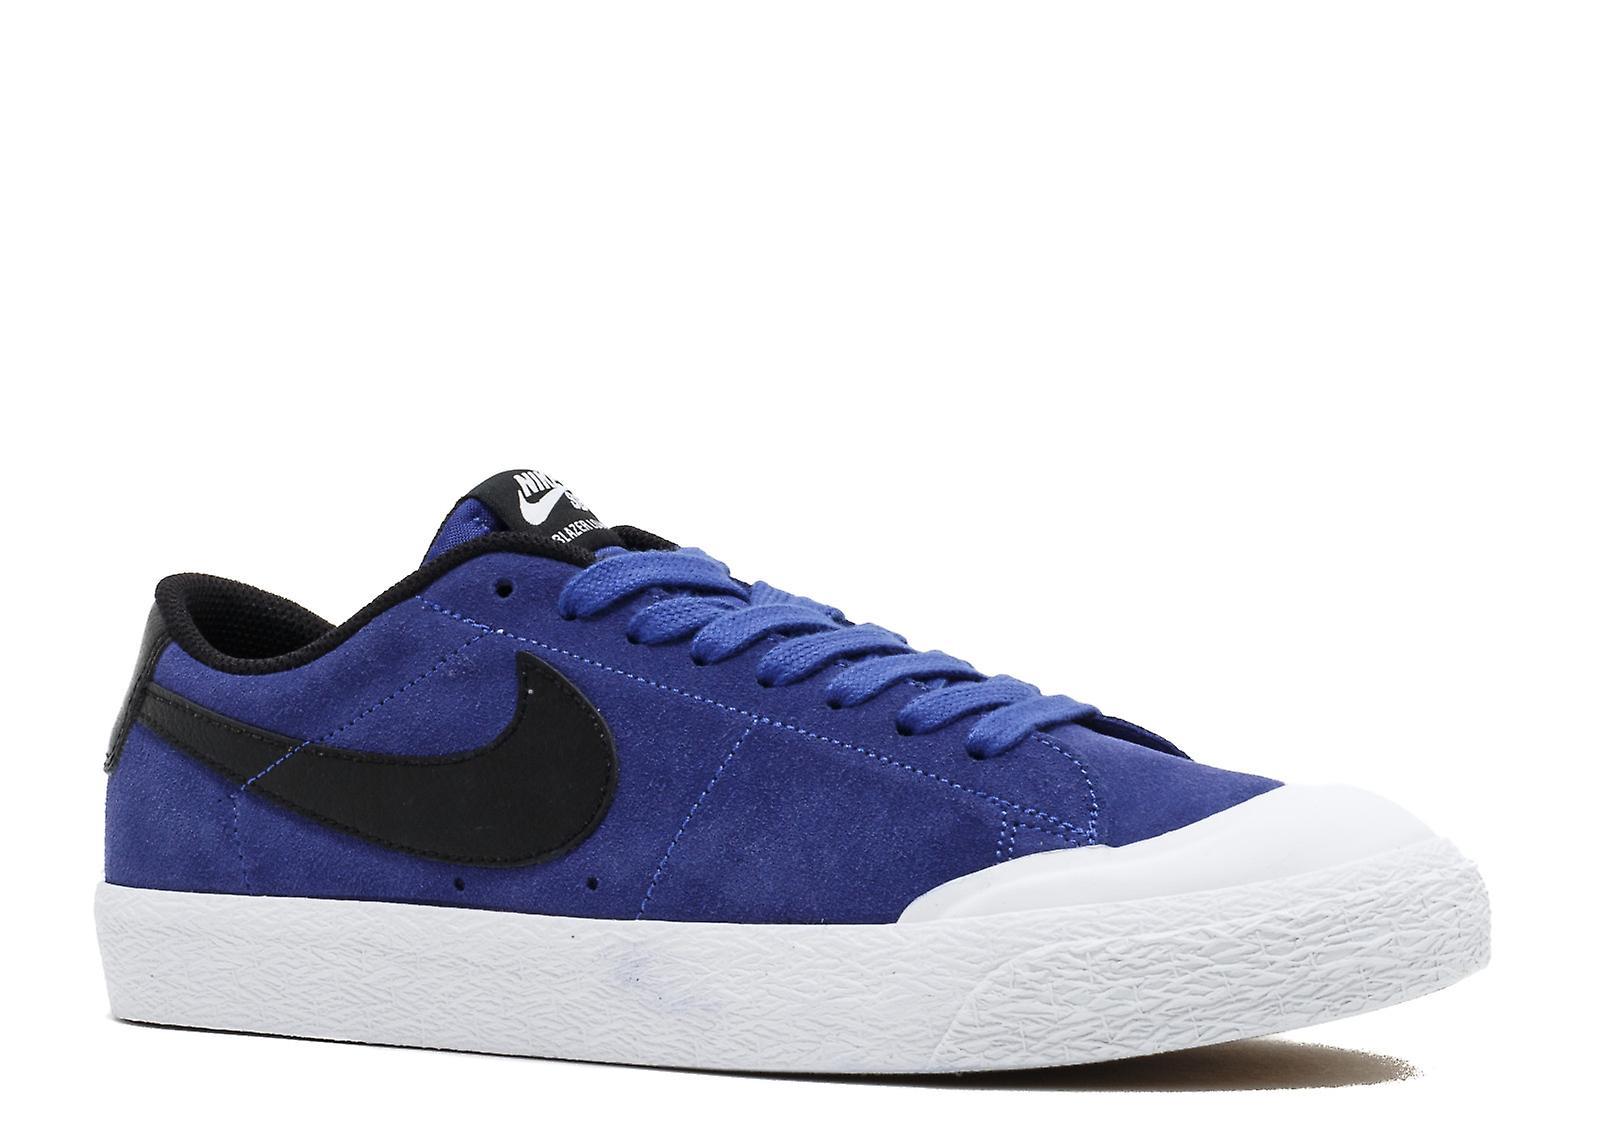 buy popular fe1c8 41e6f Nike Sb Blazer Zoom Low Xt - 864348-501 - Shoes